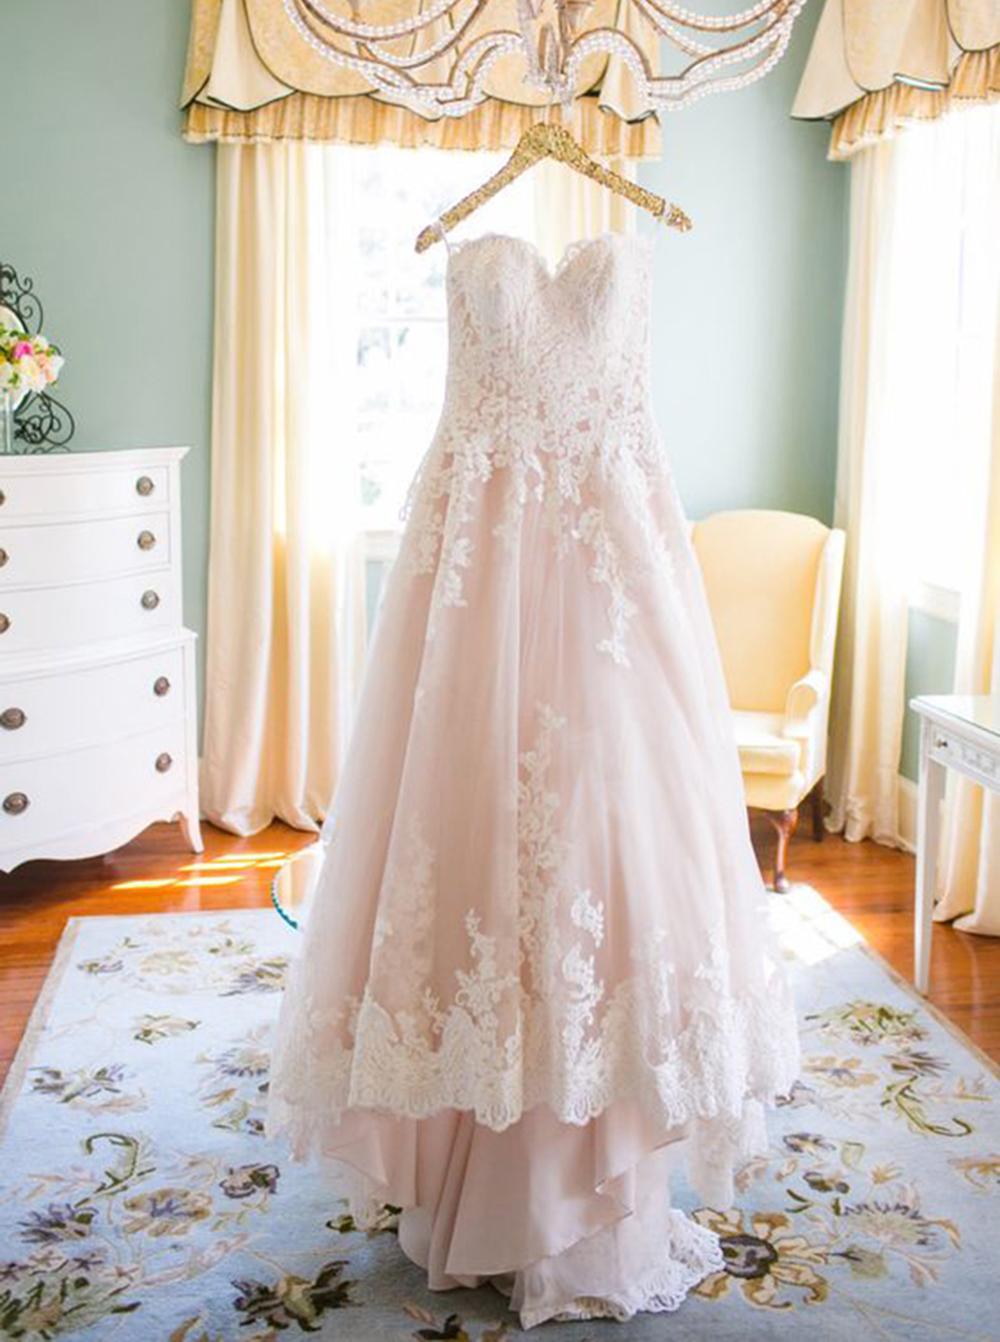 Elegant Sweetheart Hi Low Blush Wedding Dress with White Lace